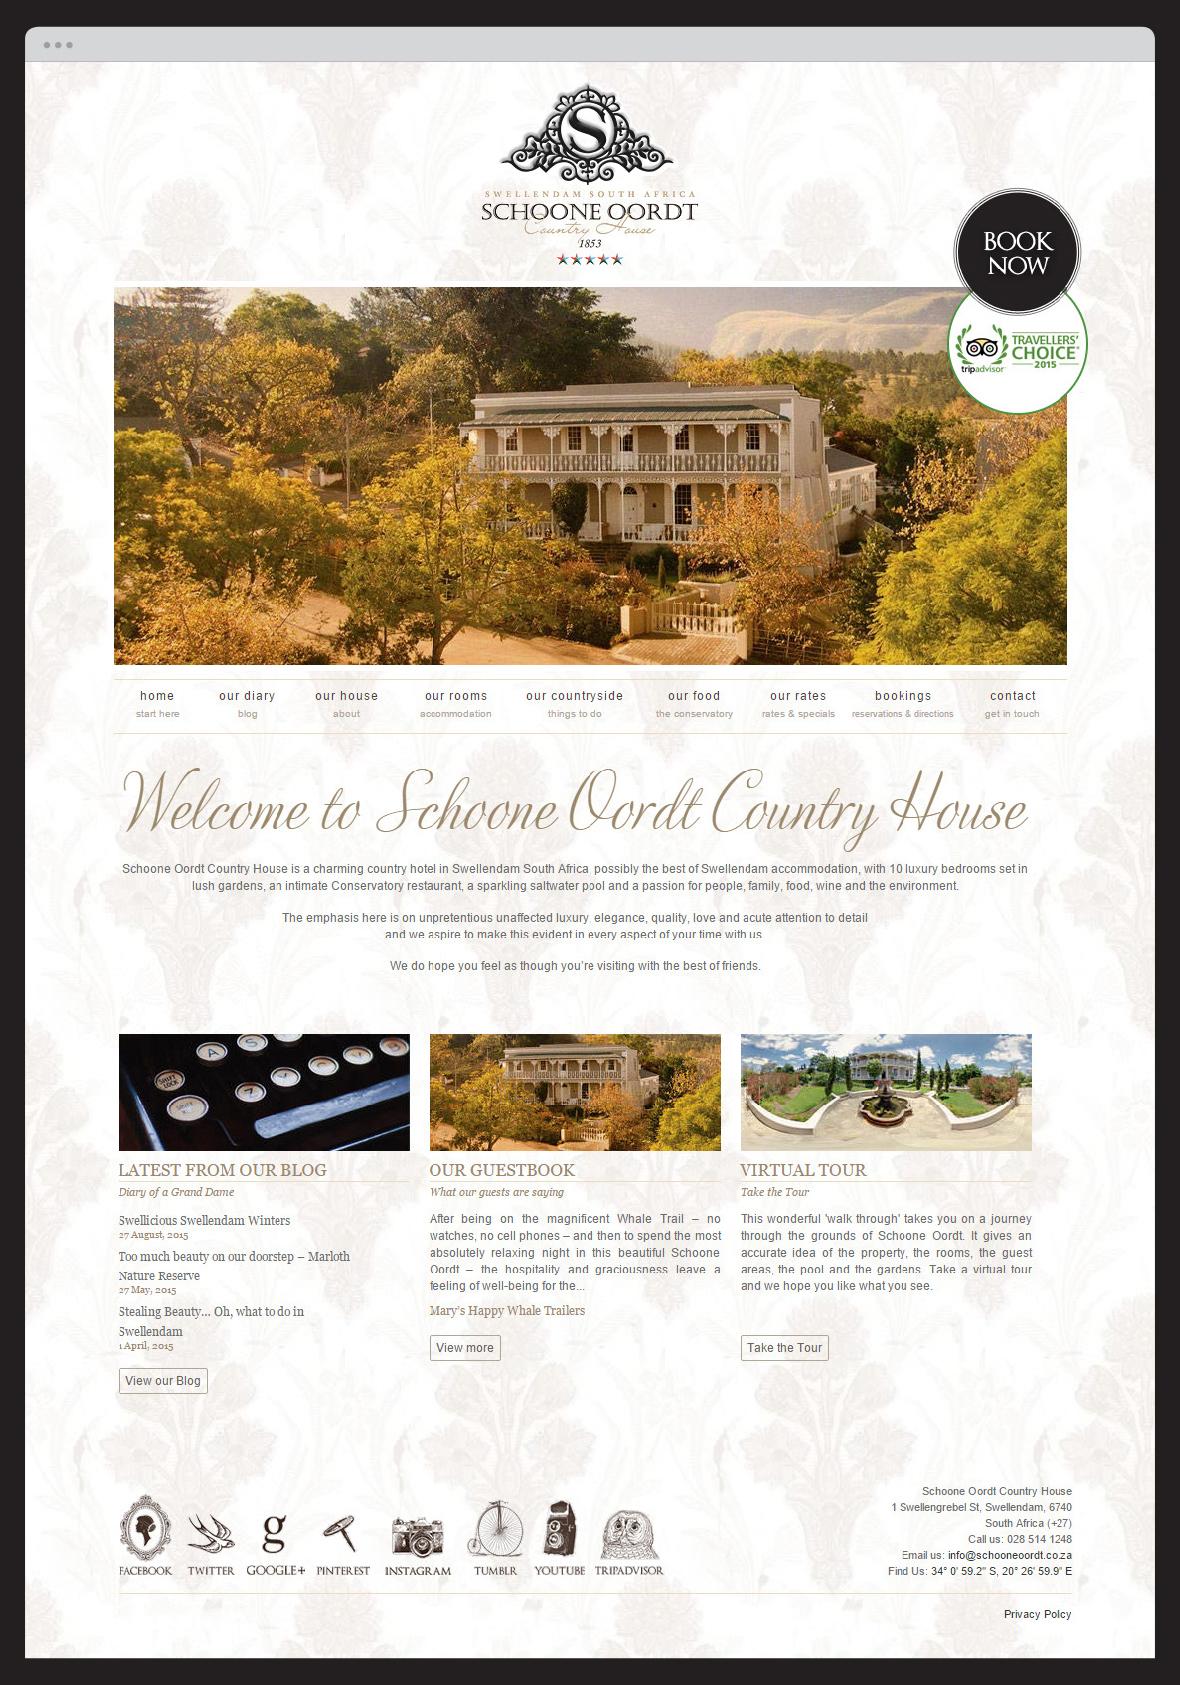 Schoone Oordt Country House Website